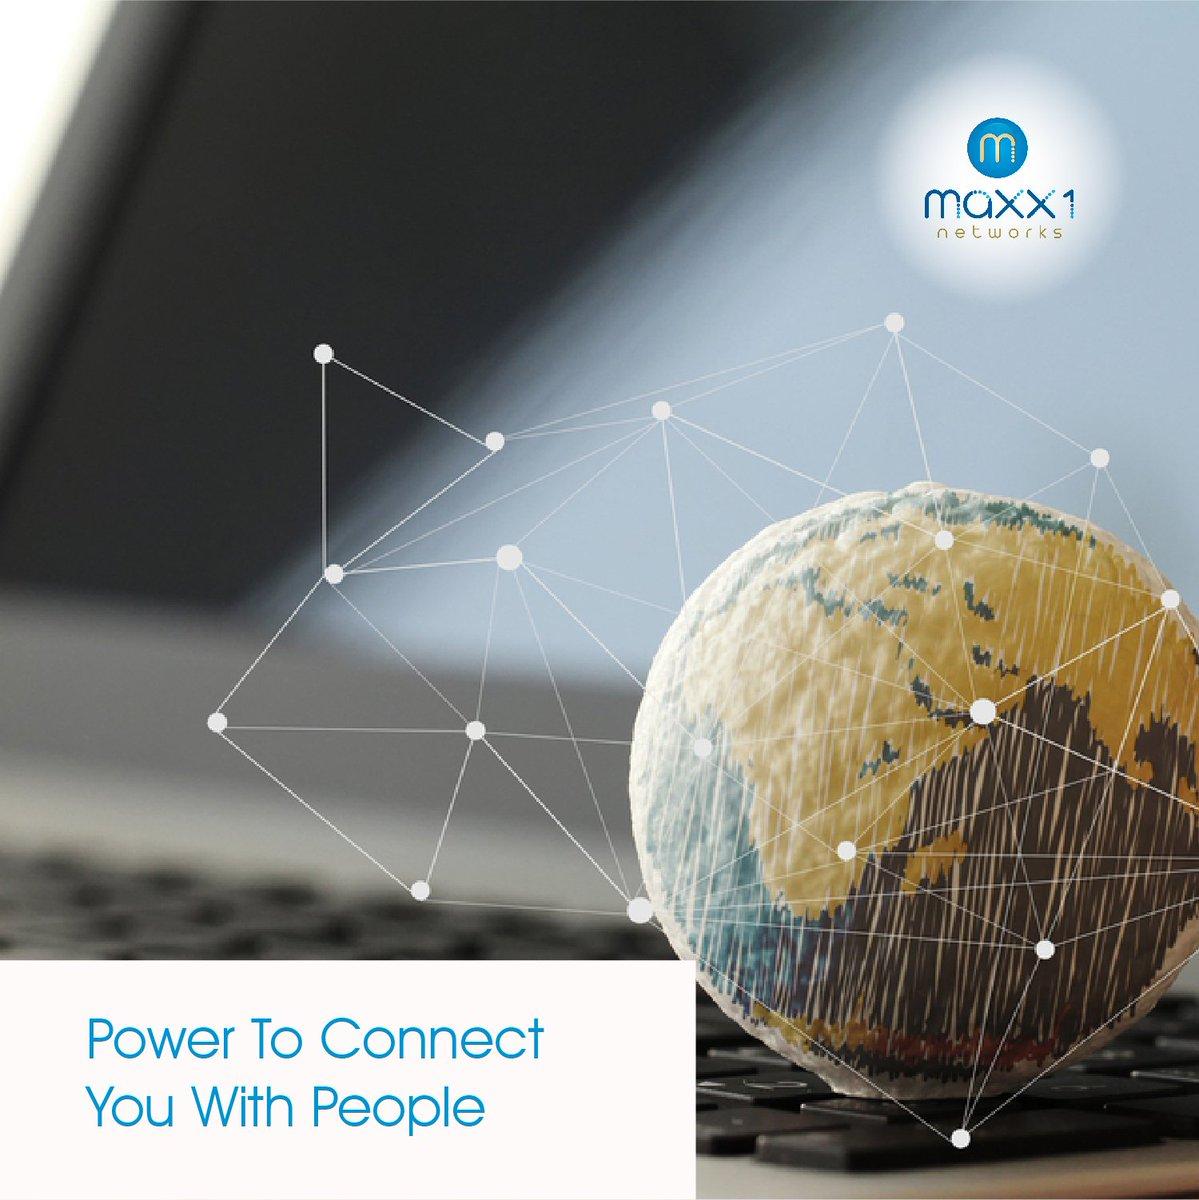 India Banega Future Ready With Internet That's Strong And Steady. #strong #india #future #internet #connection #speed #wifi #dombivlikar #dombivli